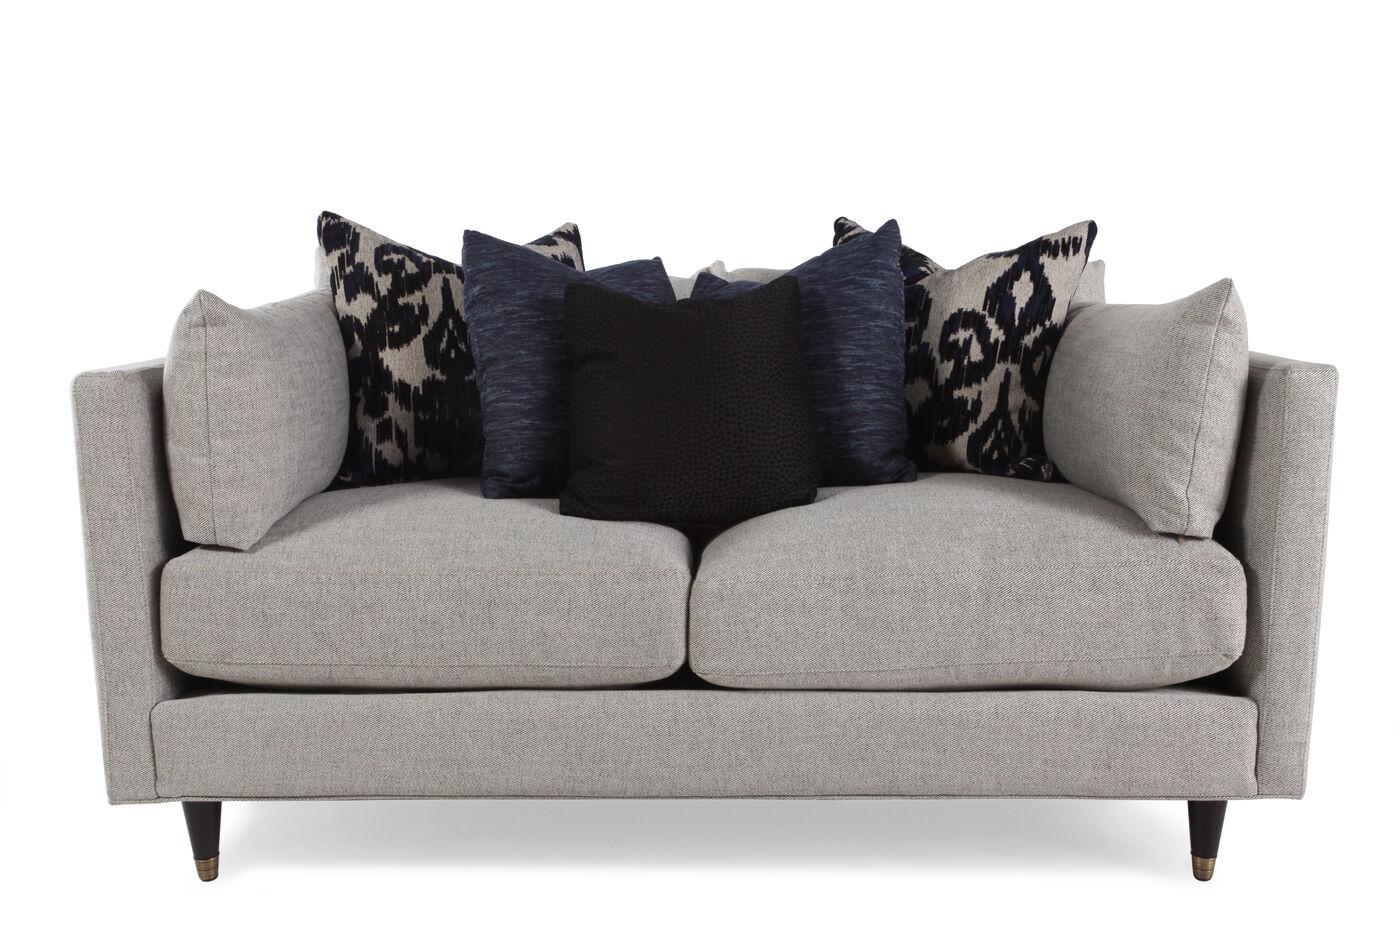 Low Profile 70 Quot Sofa In Cream Mathis Brothers Furniture